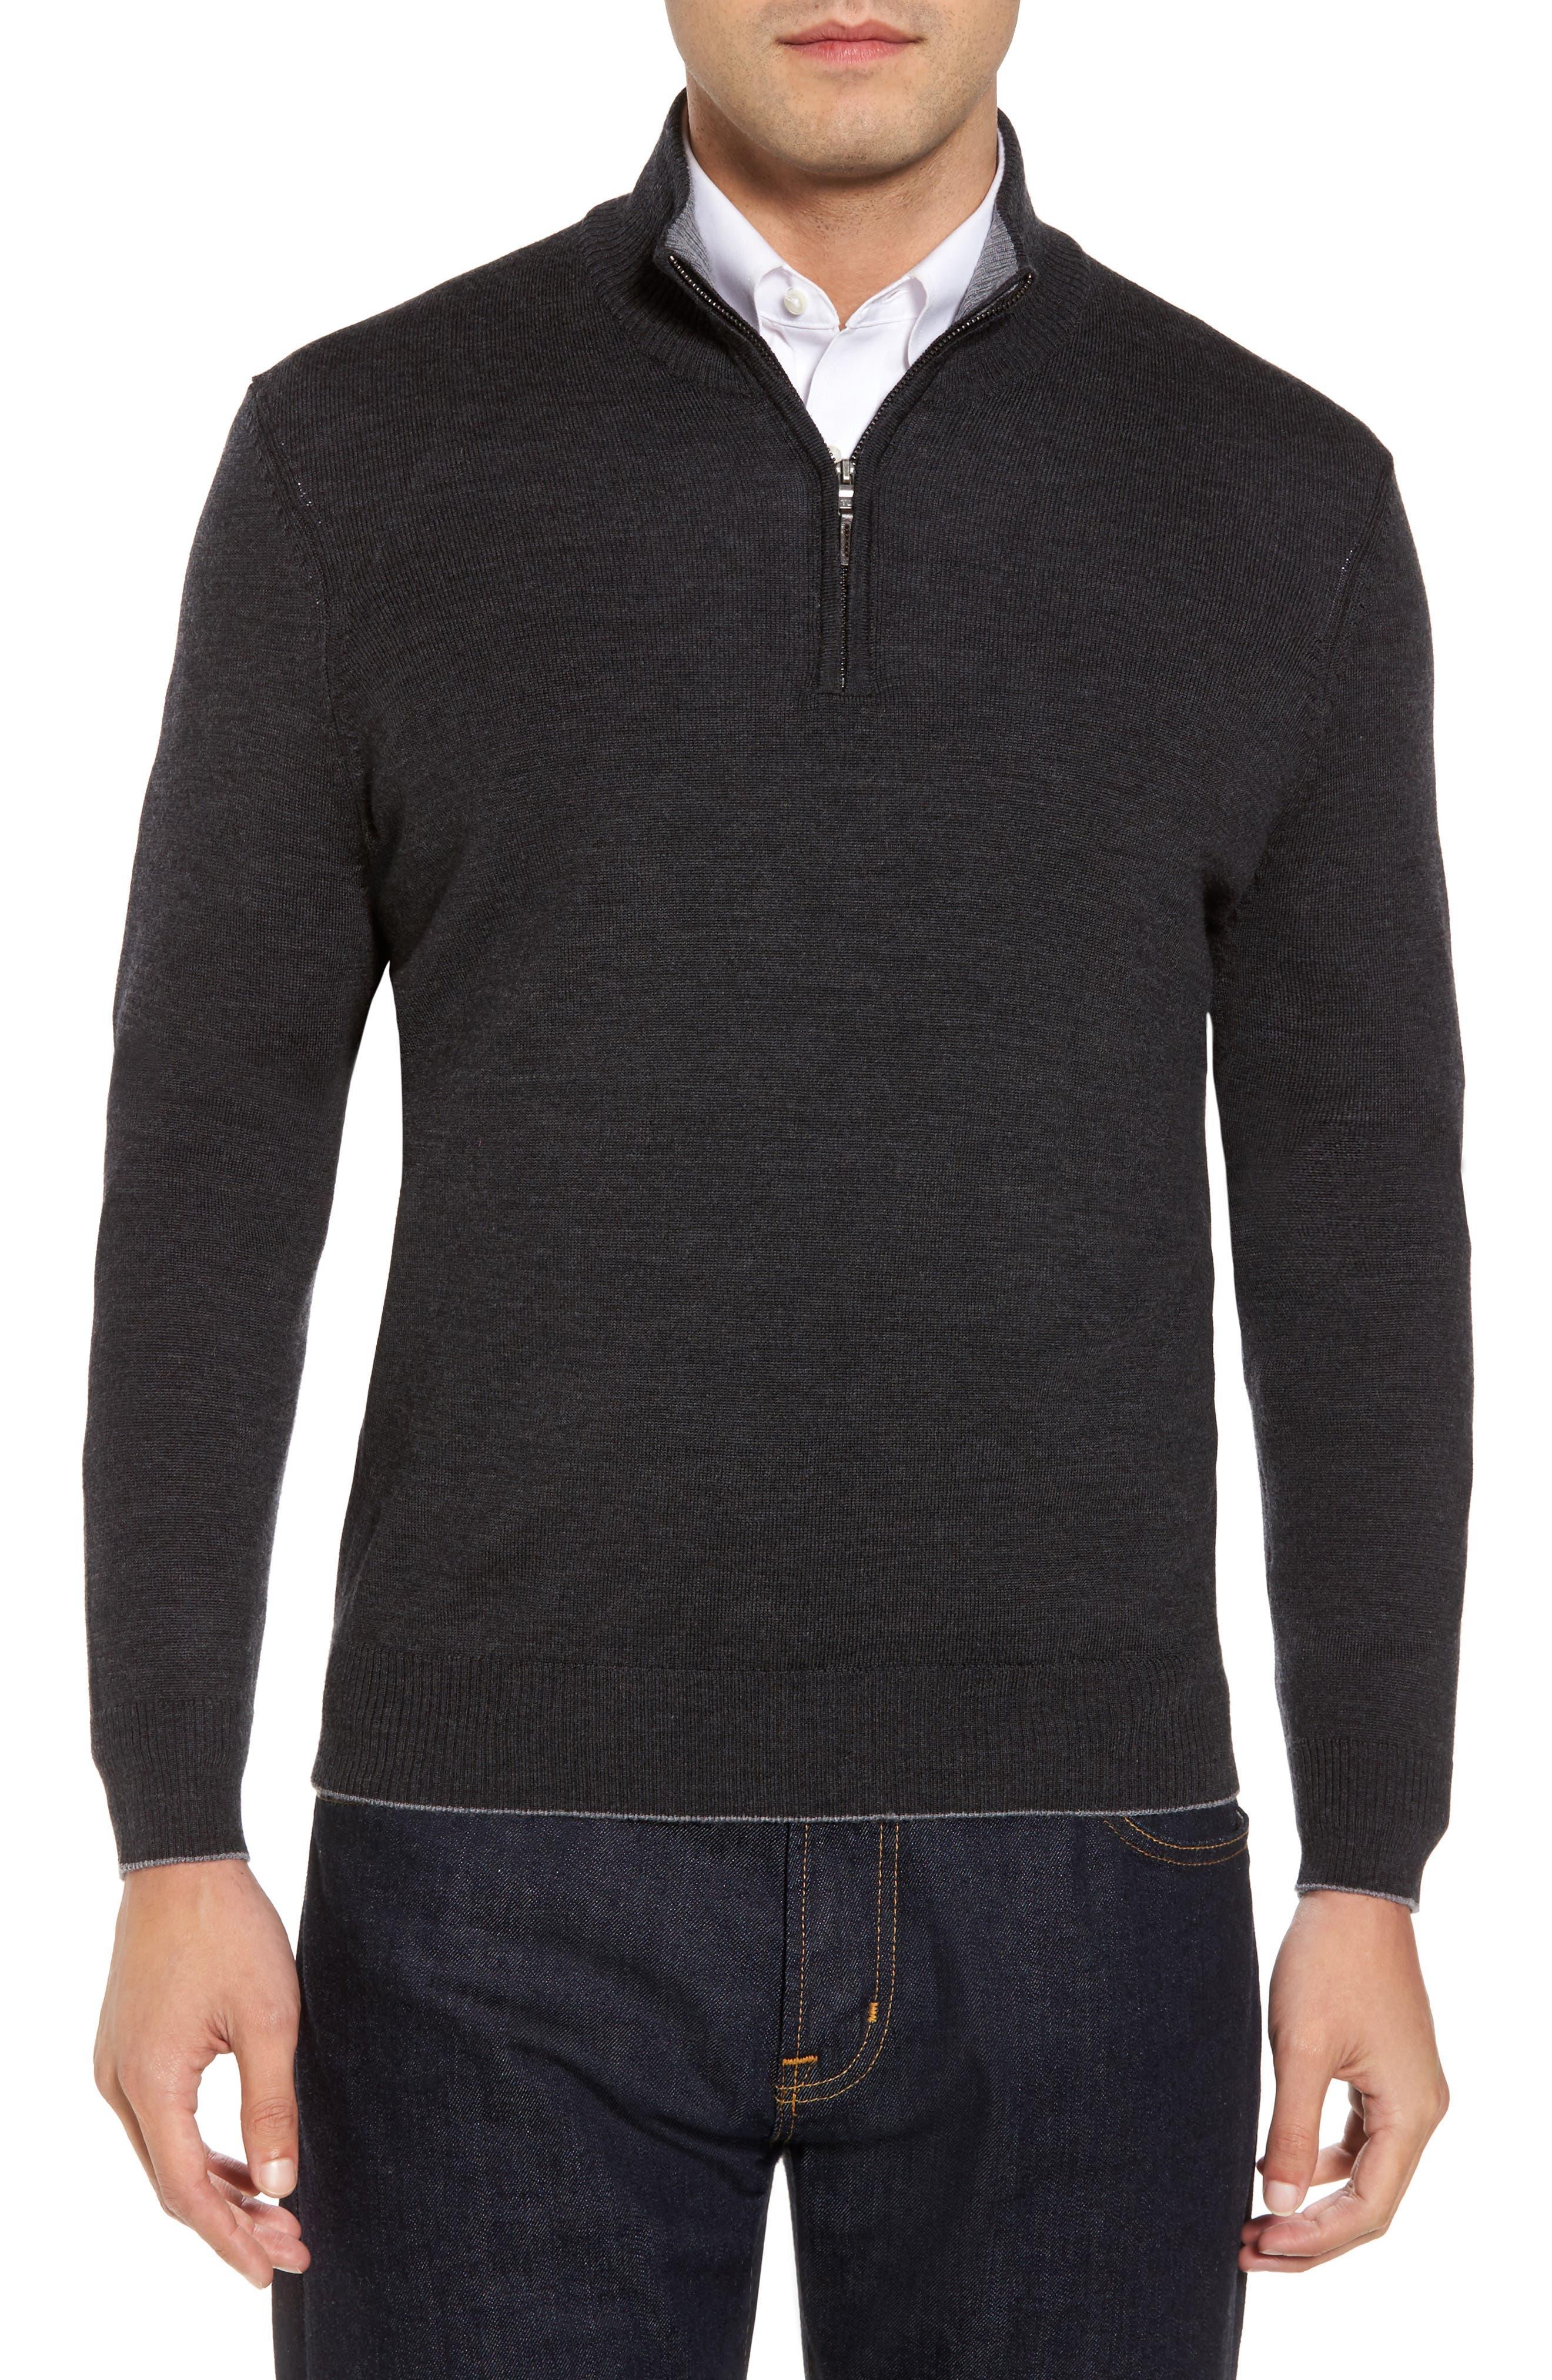 THOMAS DEAN,                             Merino Wool Blend Quarter Zip Sweater,                             Main thumbnail 1, color,                             020